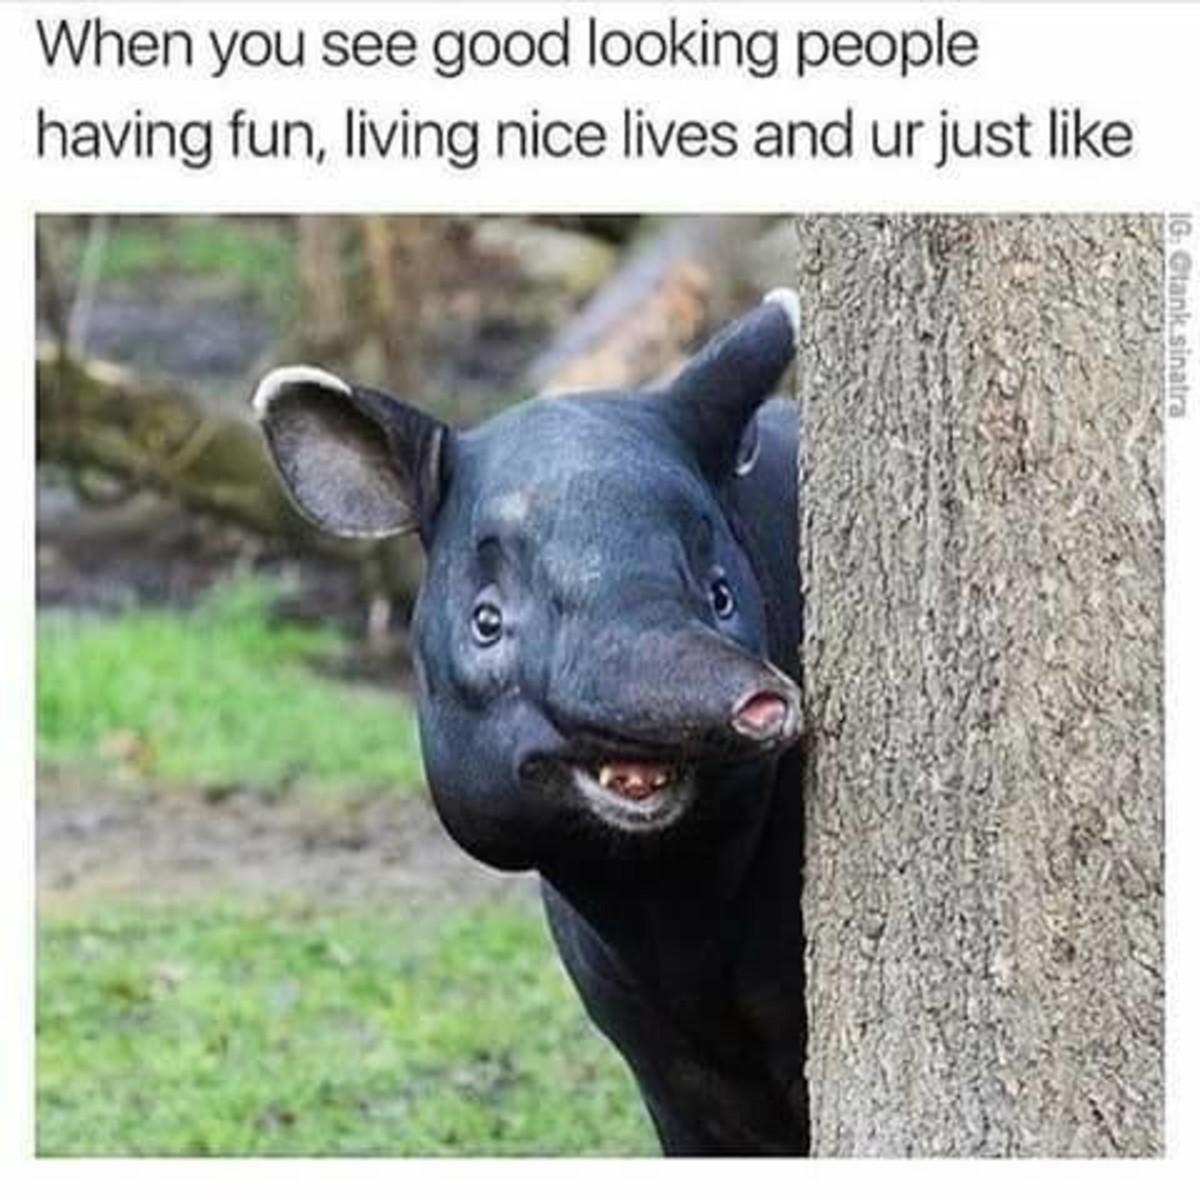 Tultosci Xiclovotru. . anus.. Is that an elephant pig?